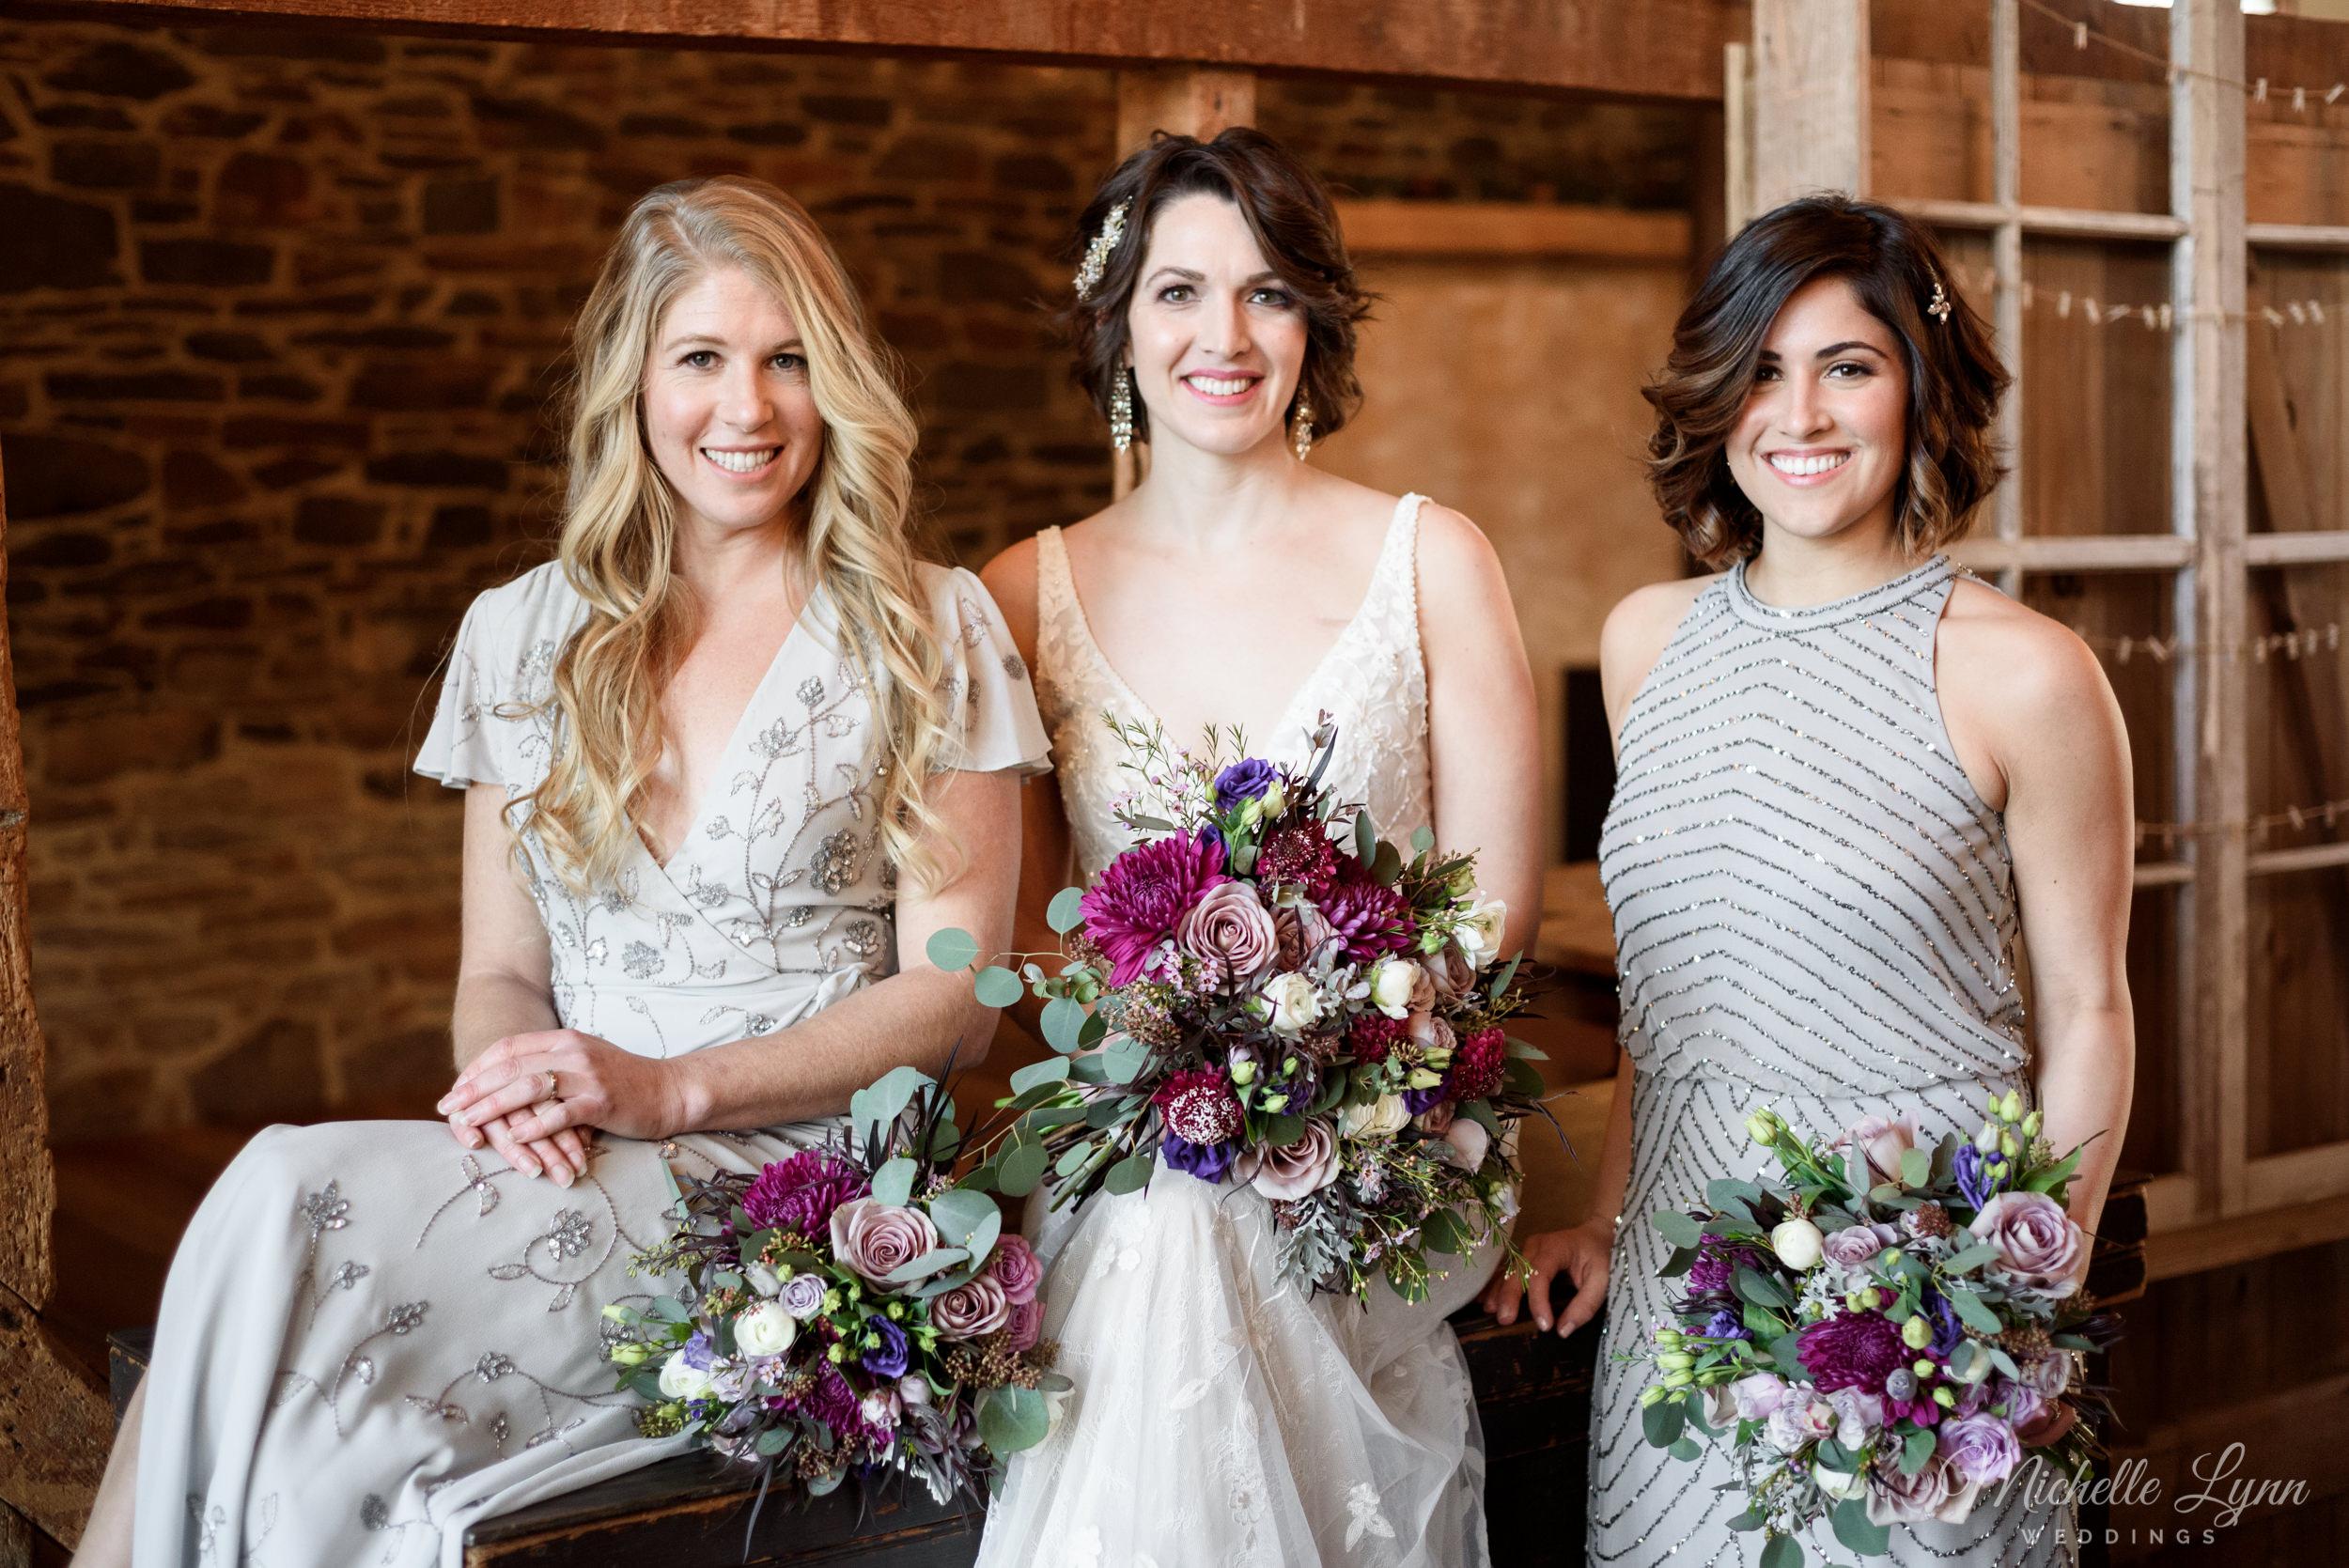 mlw-historic-stonebrook-farm-wedding-photographer-28.jpg